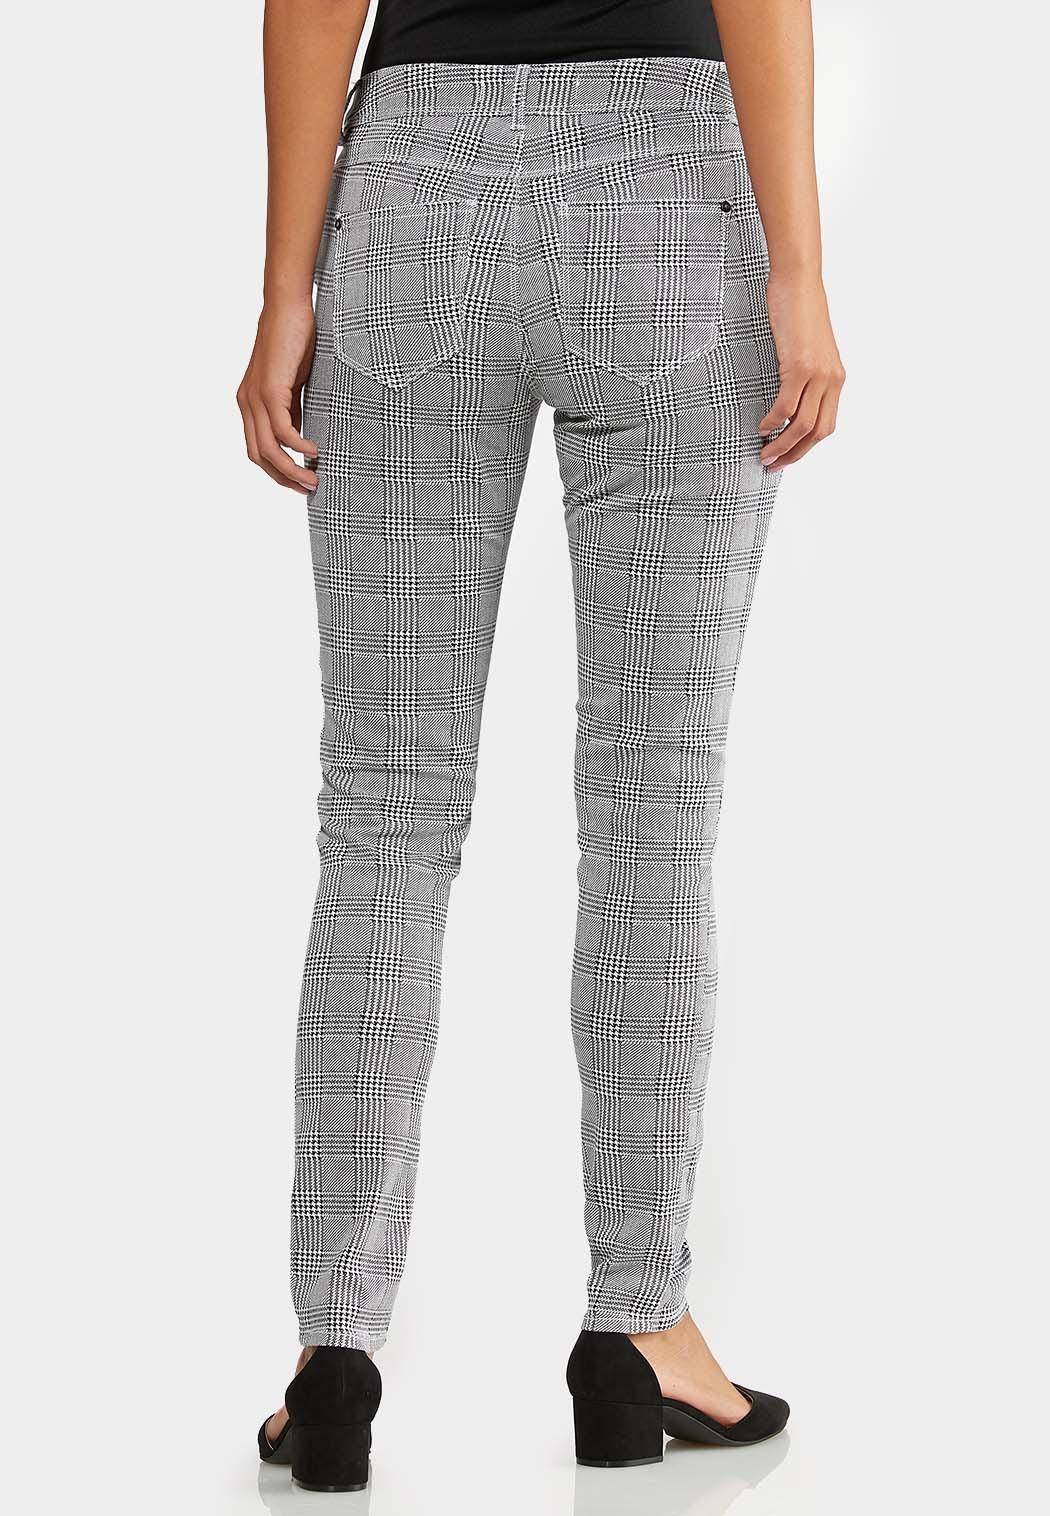 Houndstooth Skinny Jeans (Item #43949105)